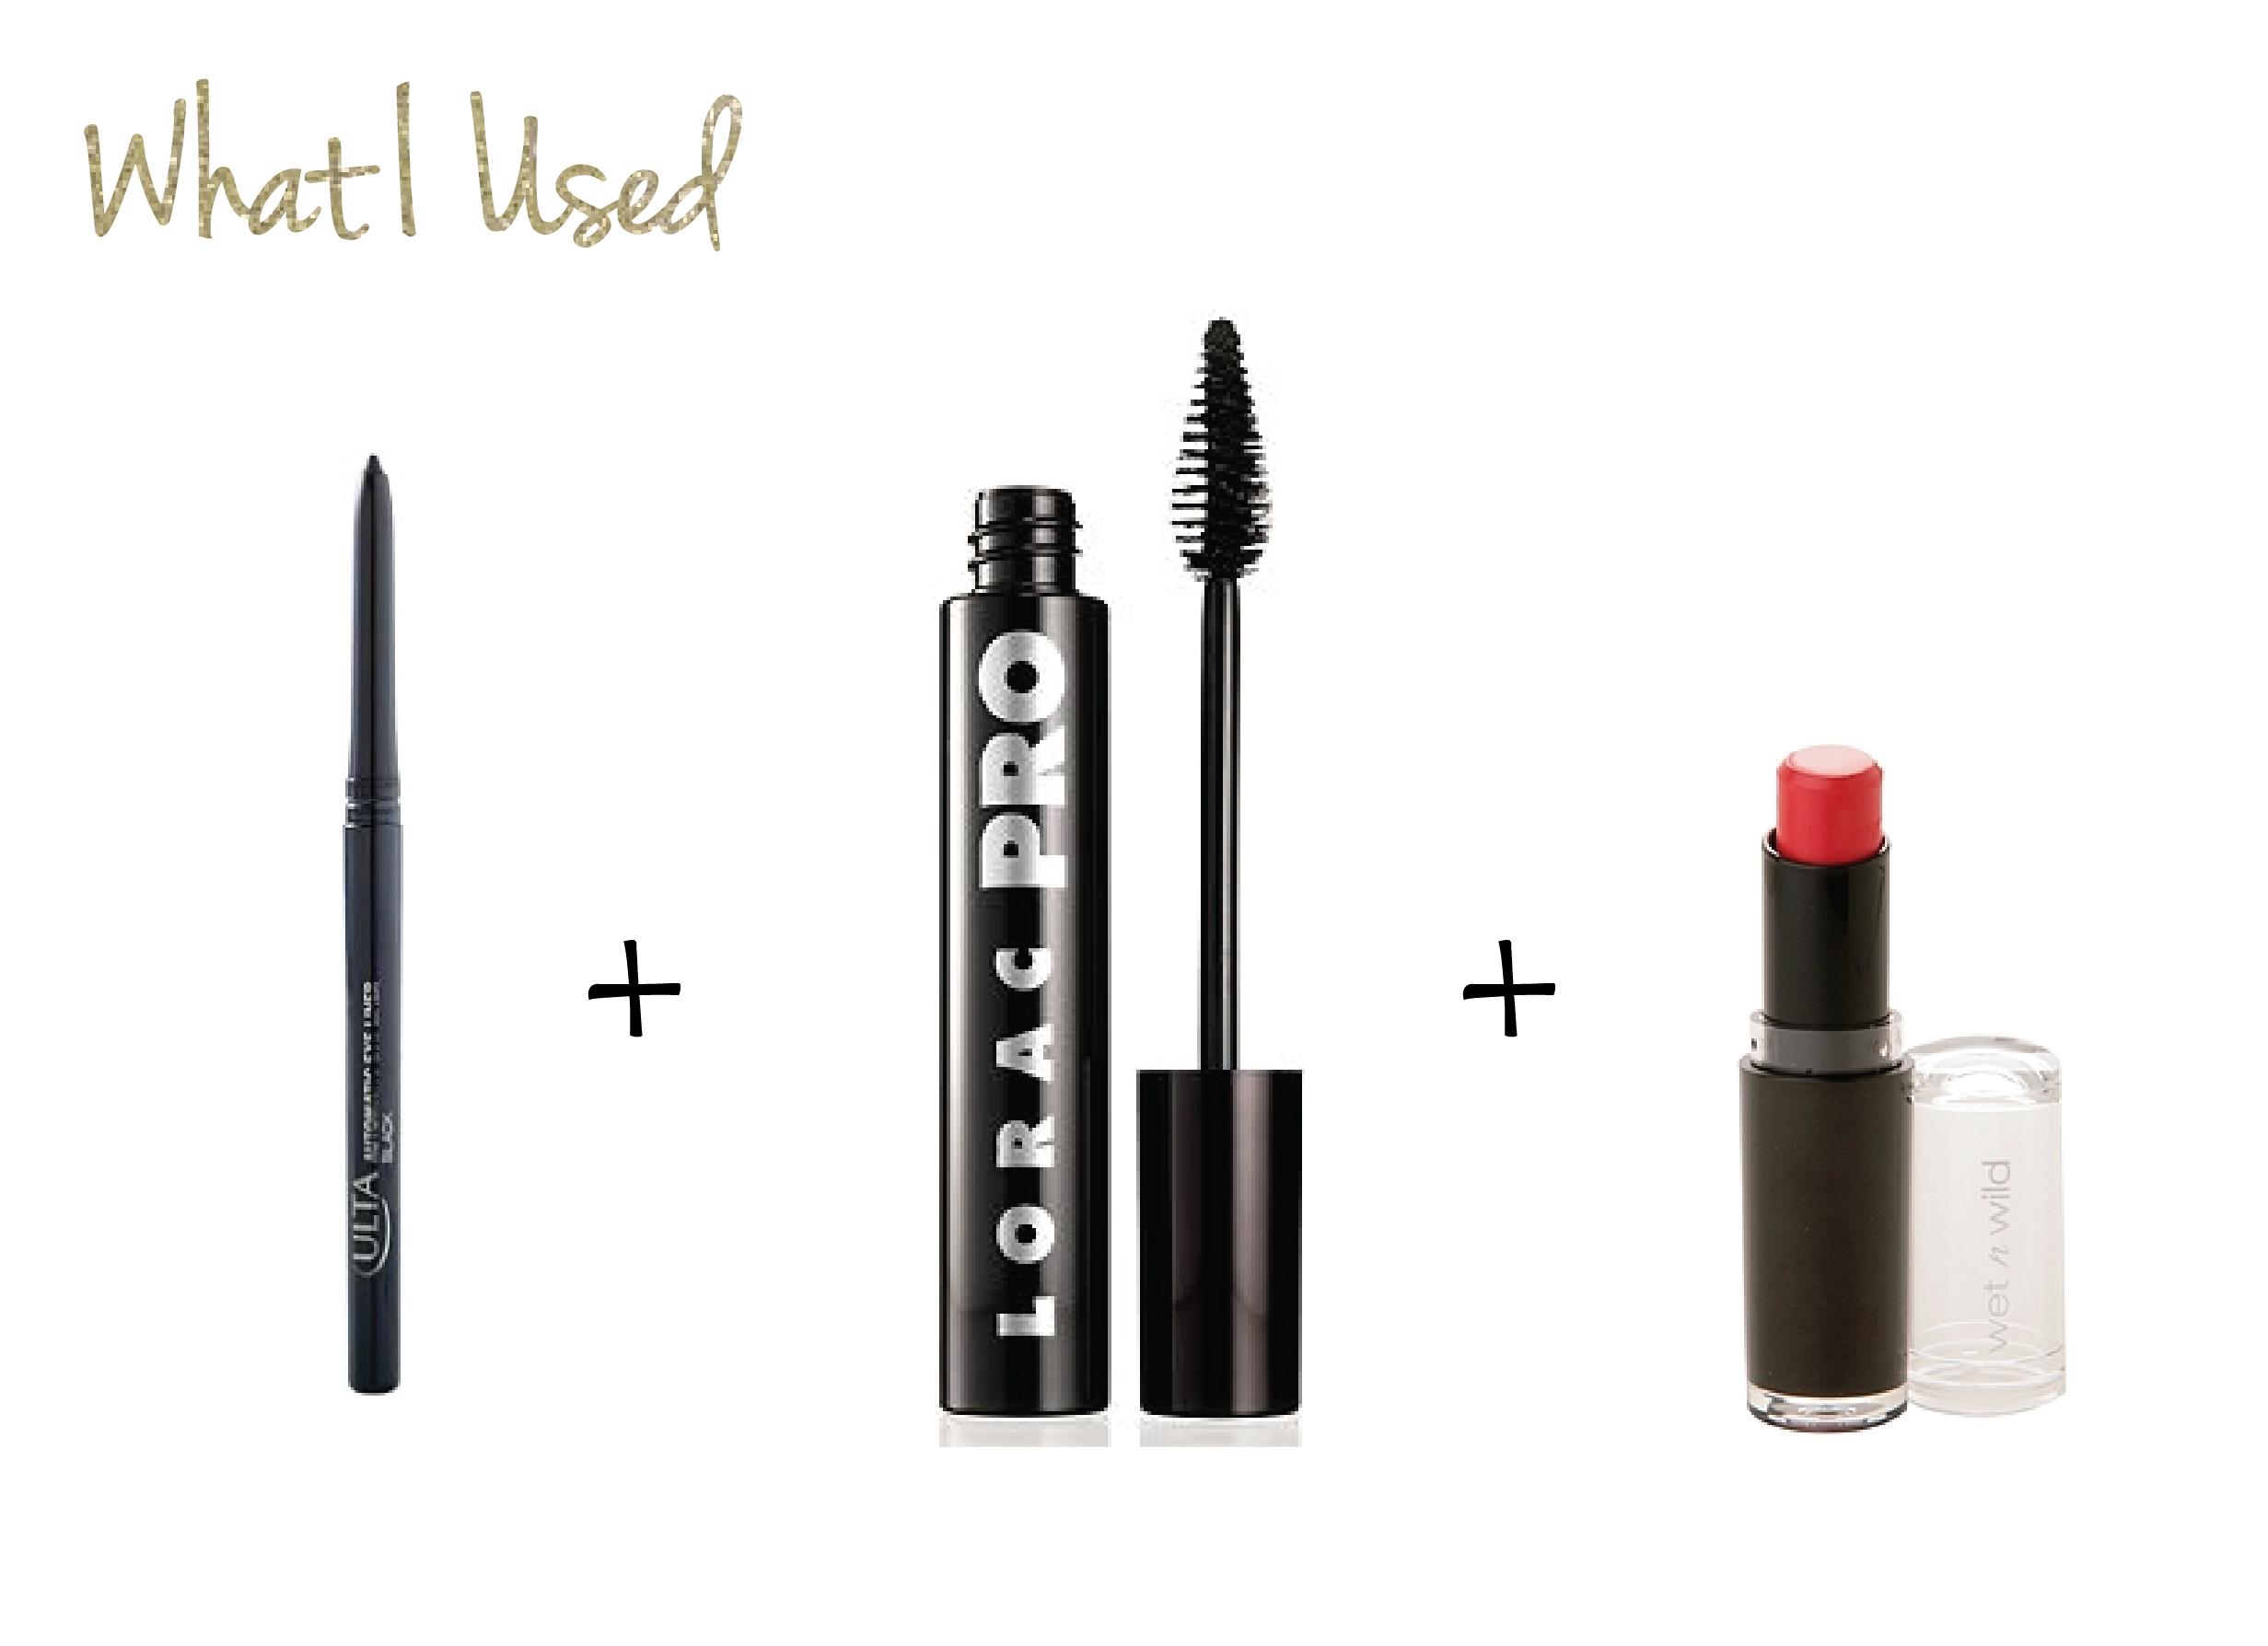 ULTA Automatic Eyeliner  in Black •  LORAC PRO Mascara  in Black °  Wet n Wild Lipstick  in Purty Persimmon